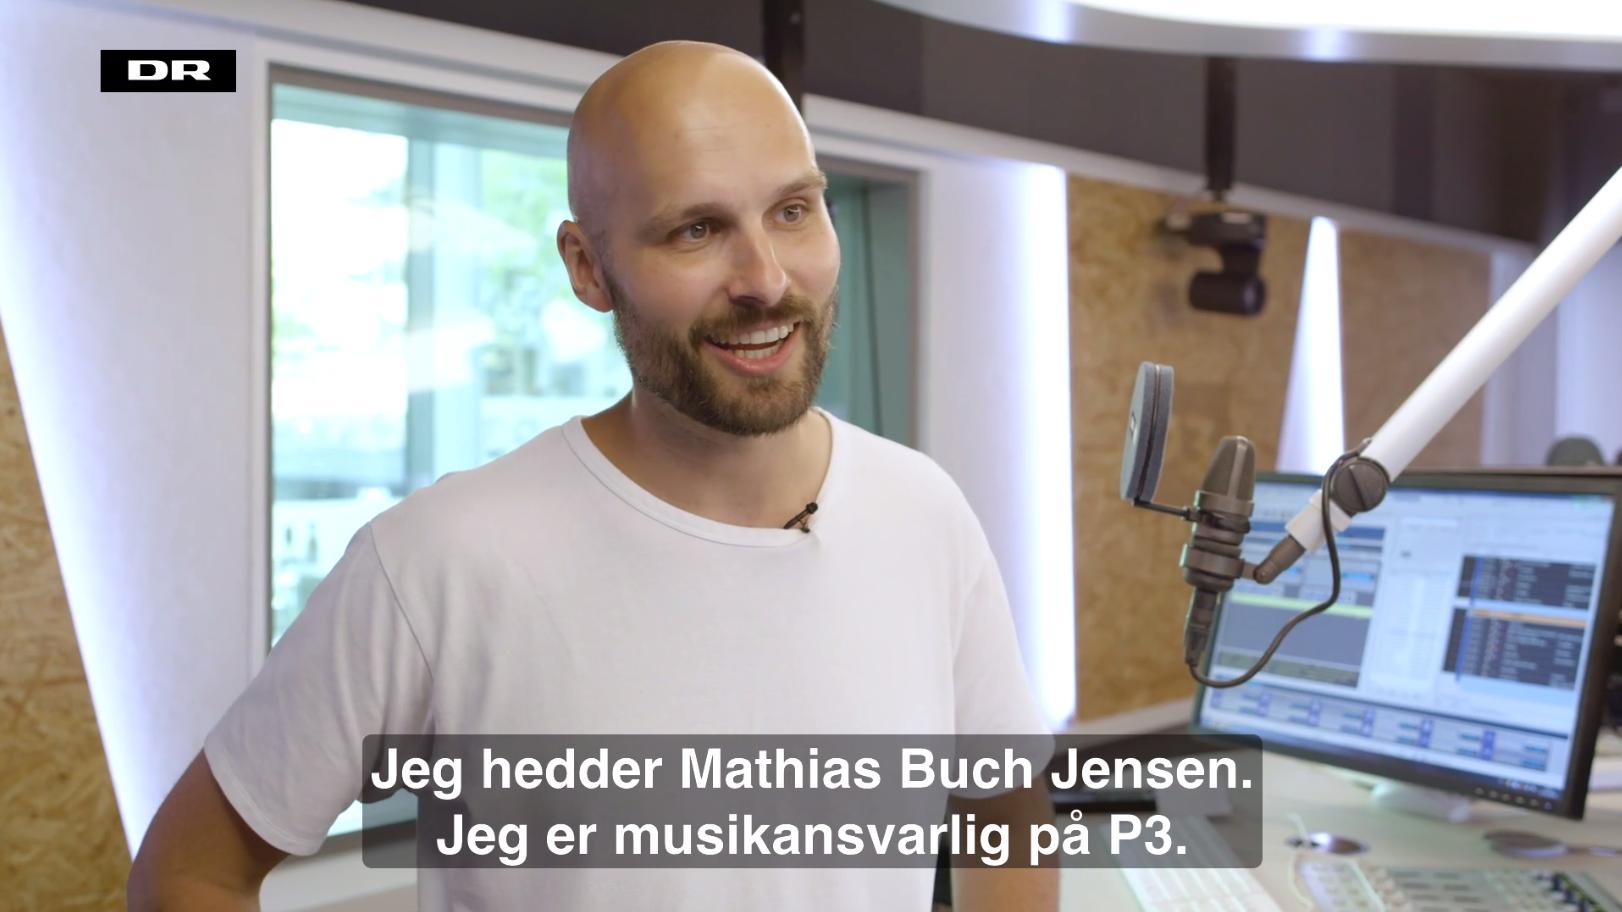 Mathias Buch Jensen - musikansvarlig